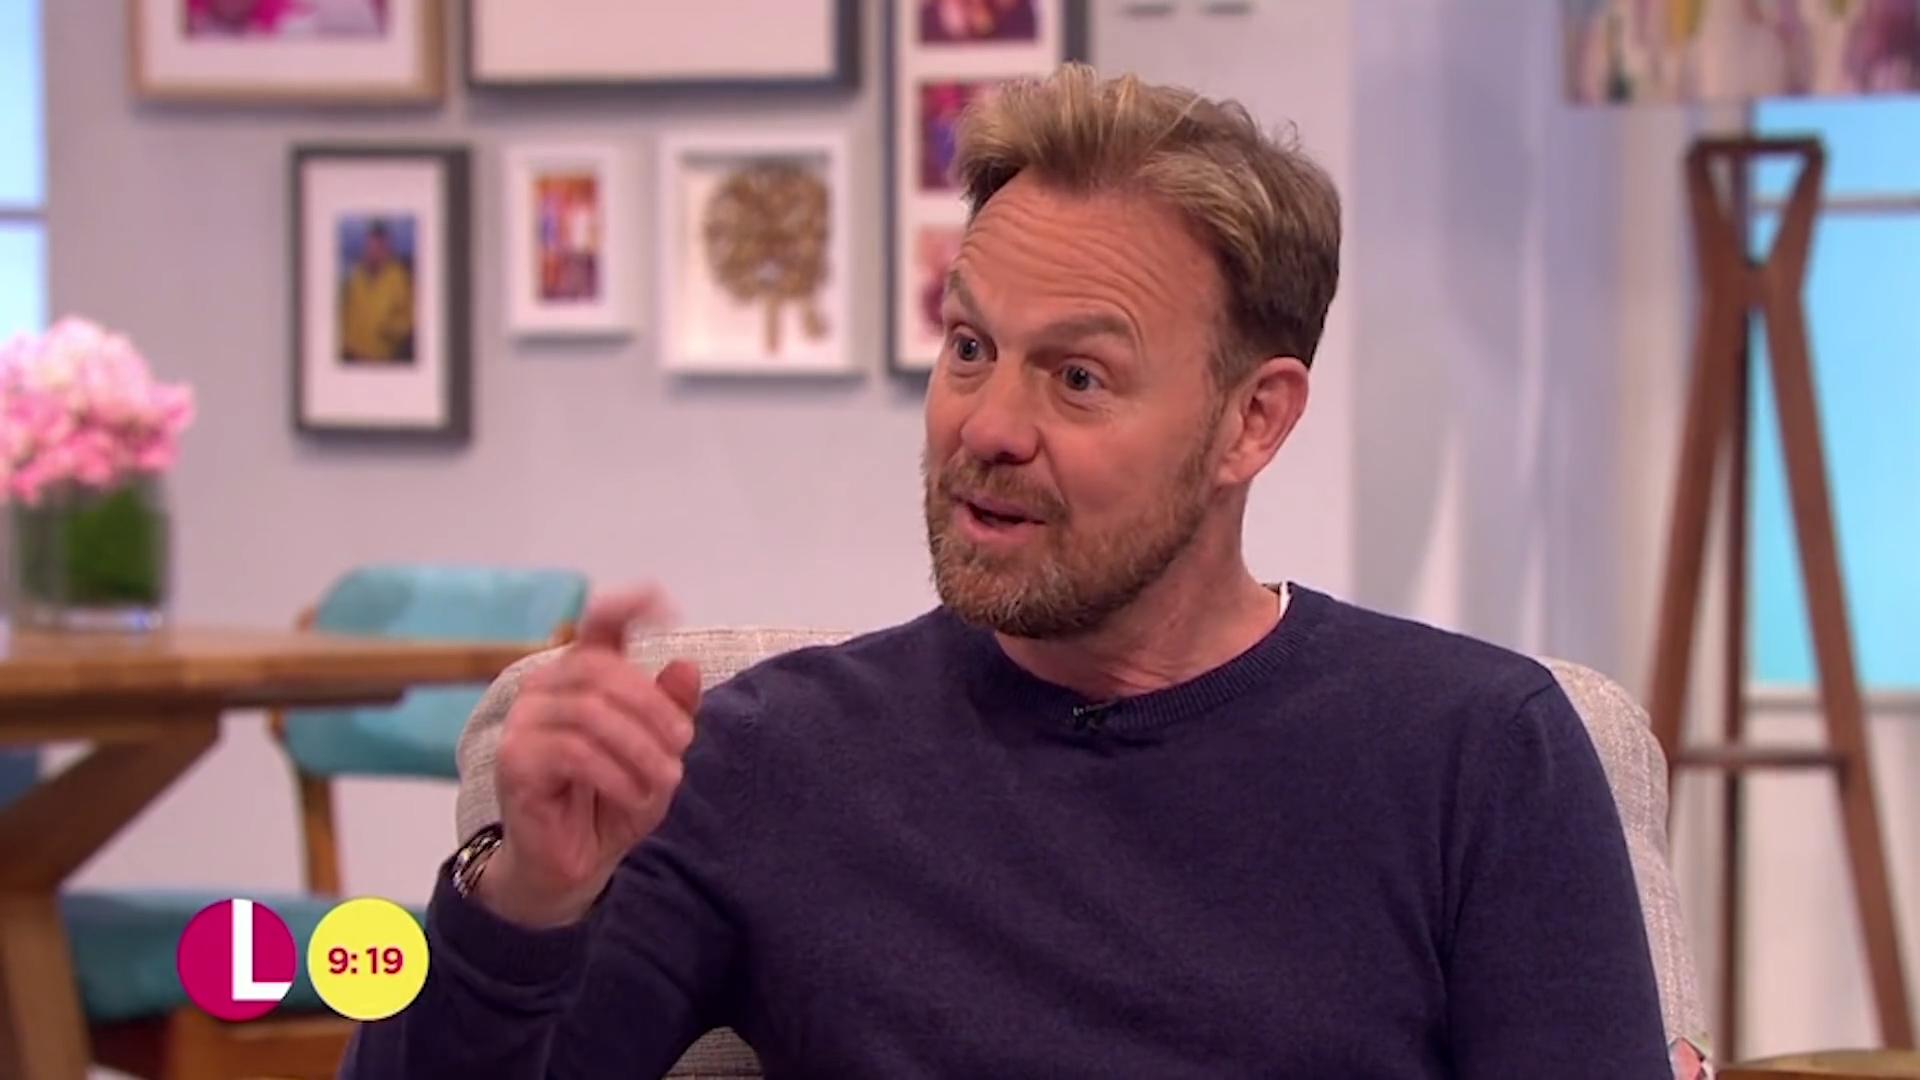 Jason Donovan looks back fondly on 'Neighbours' role